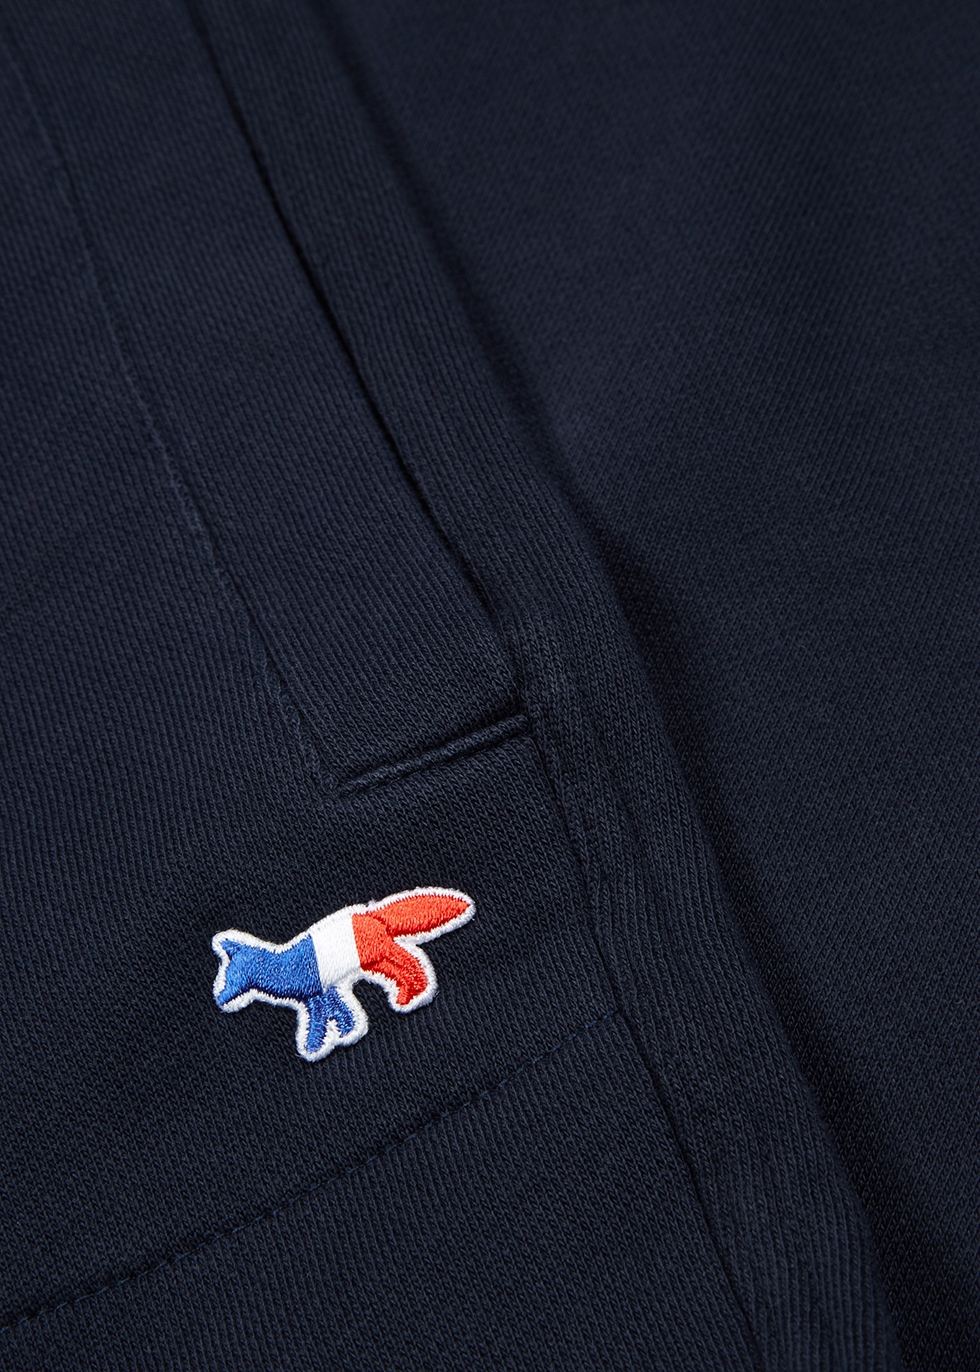 Navy cotton sweatpants - Maison Kitsuné